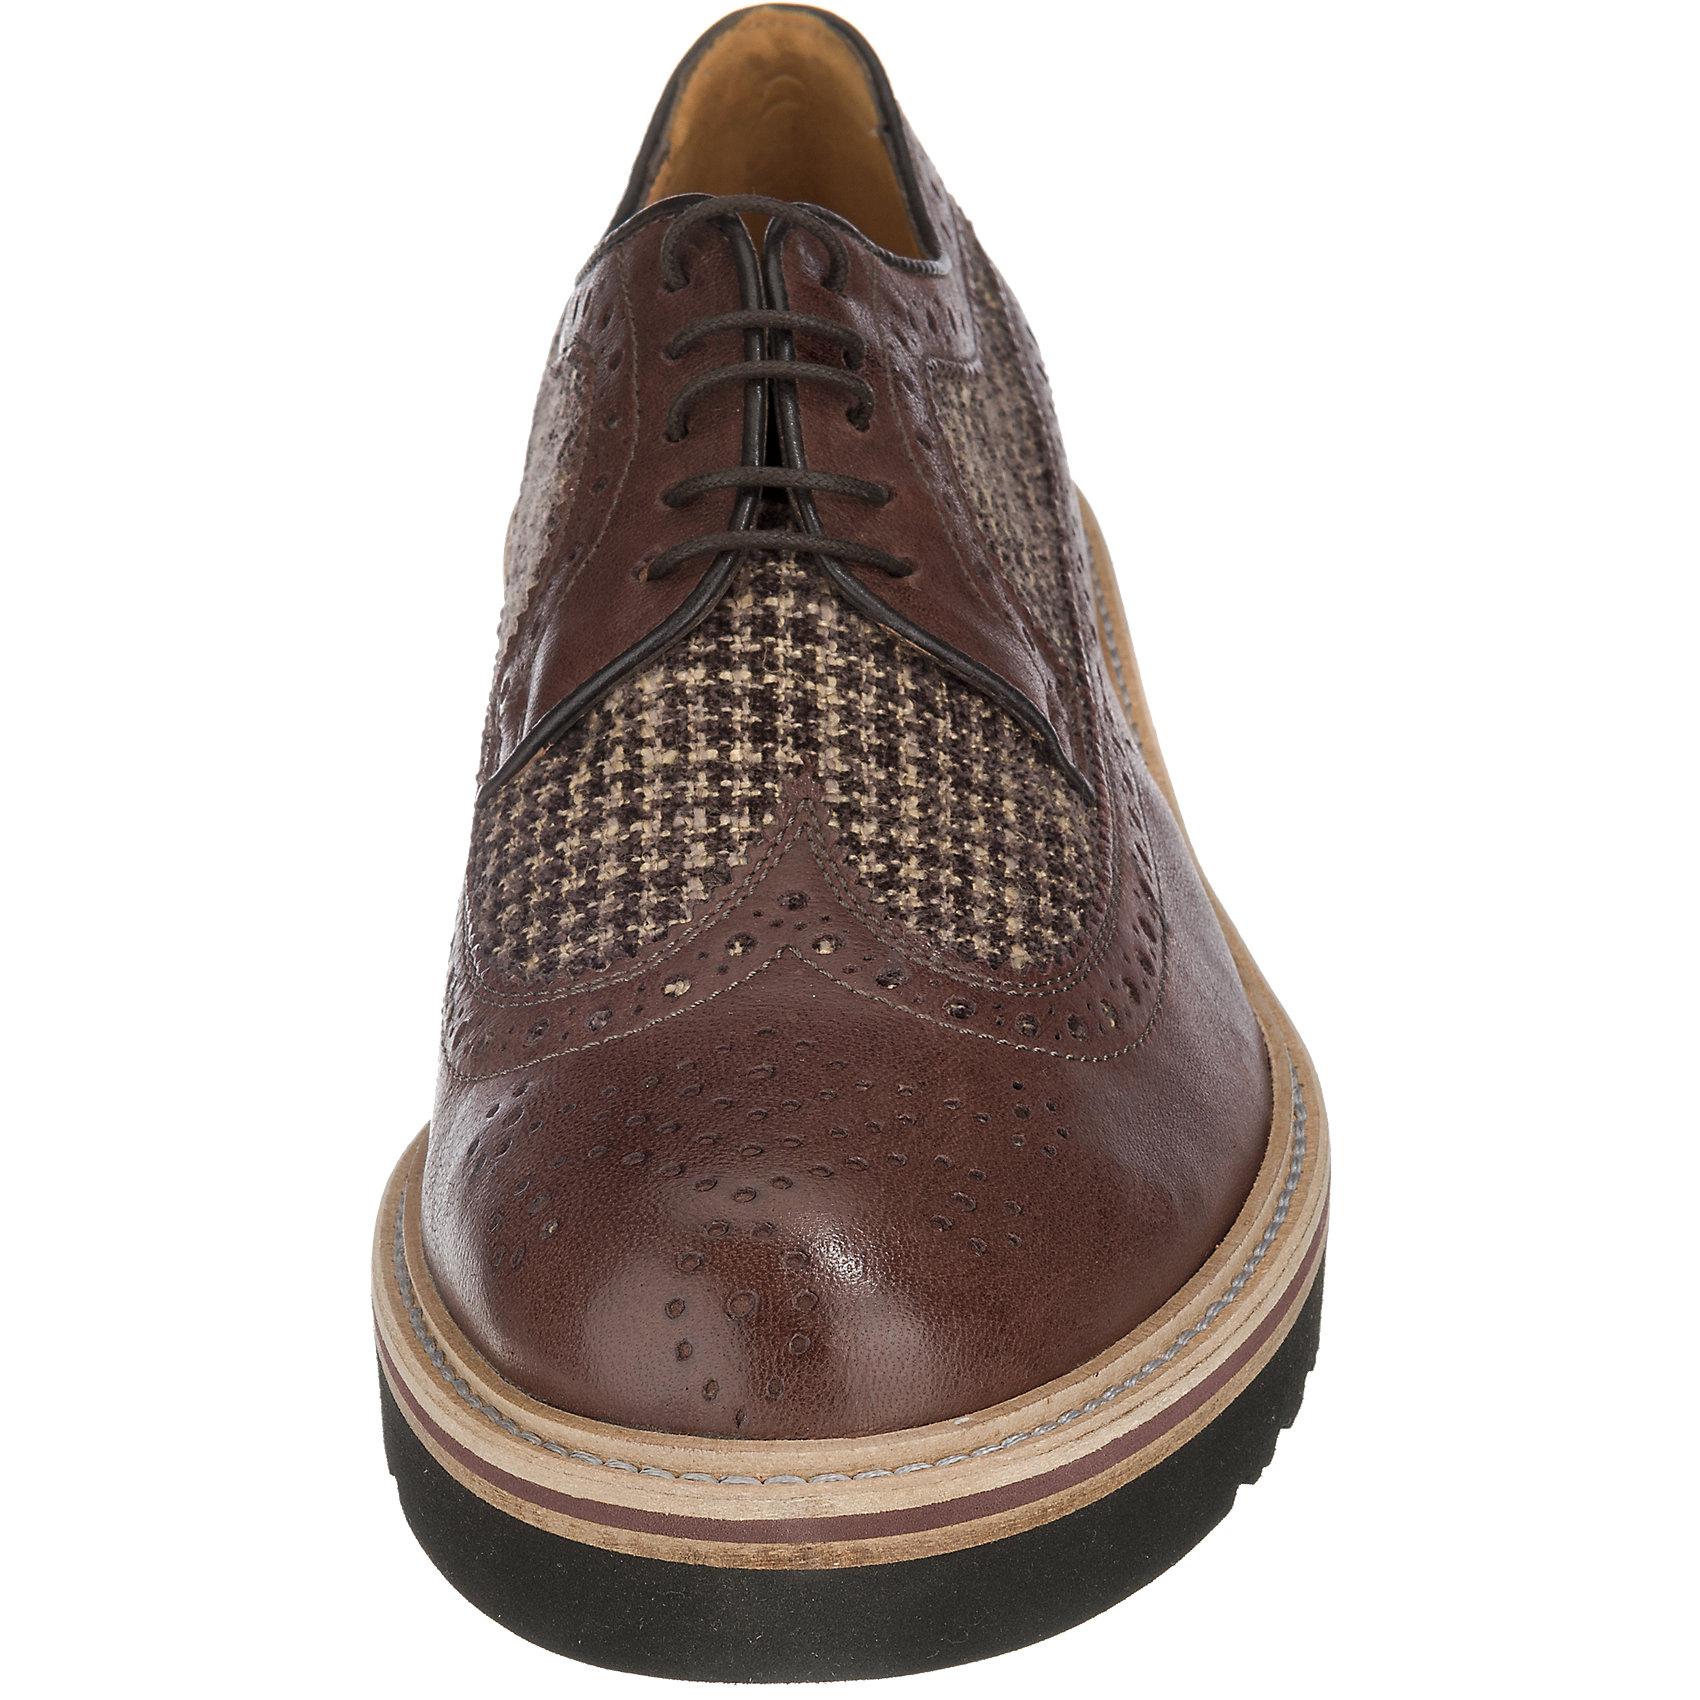 Neu ANTICA CUOIERIA Freizeit Schuhe braun 5765513